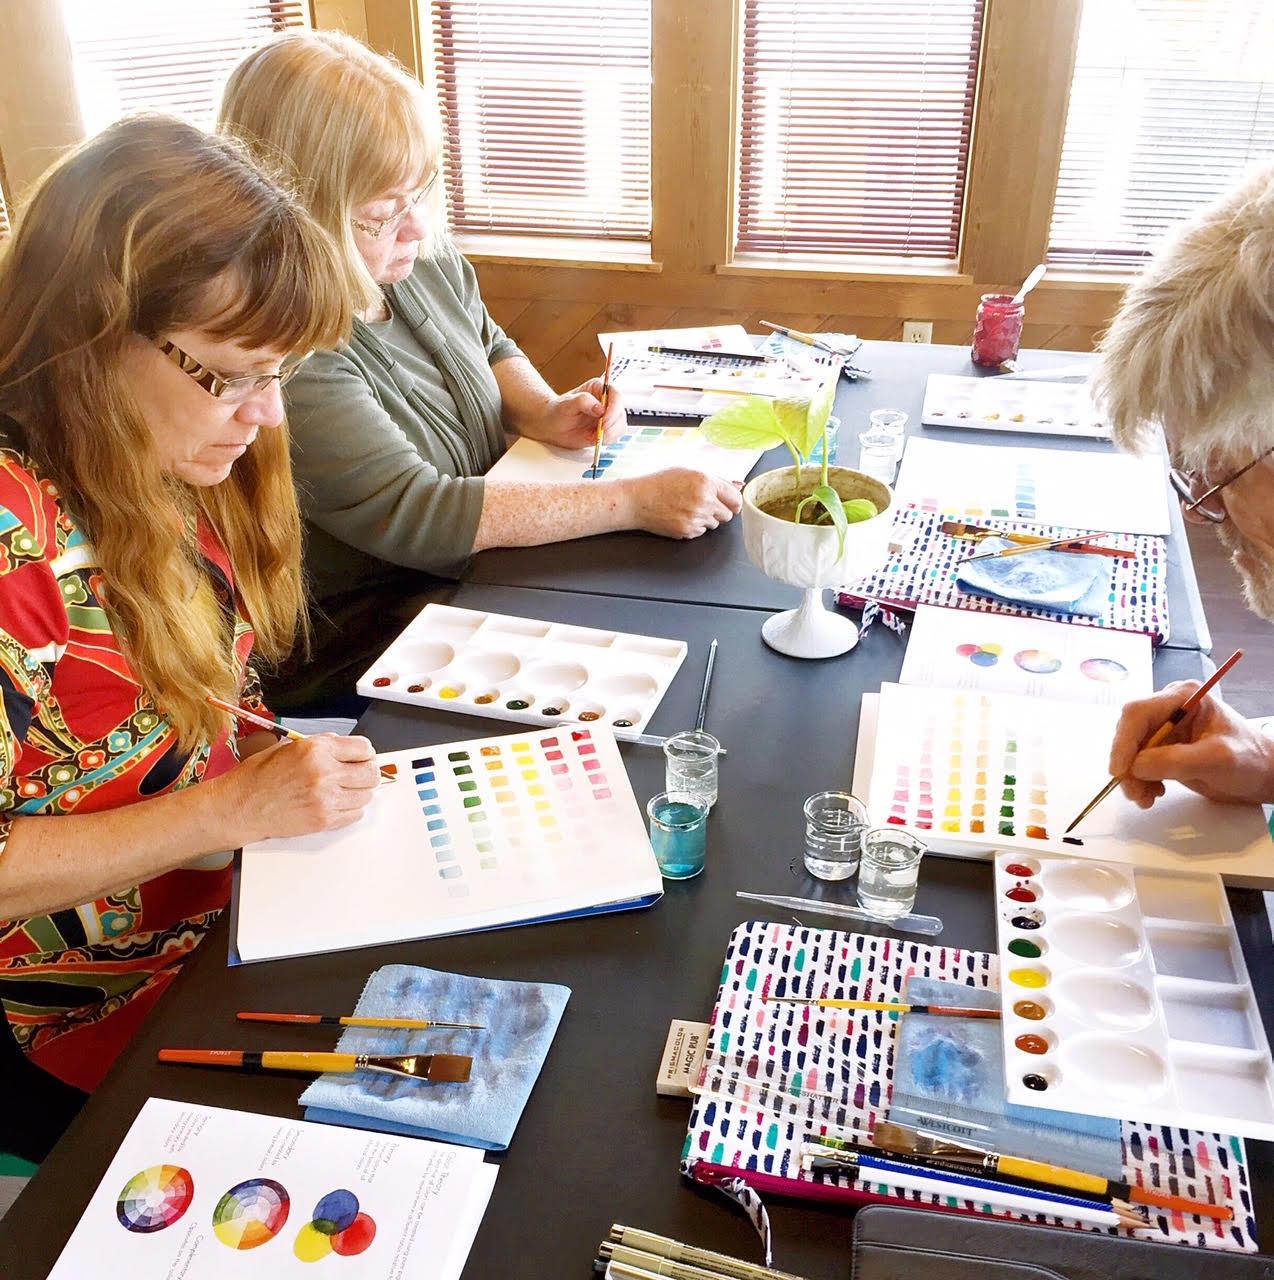 April Beginning Watercolor Eventbrite Image.png